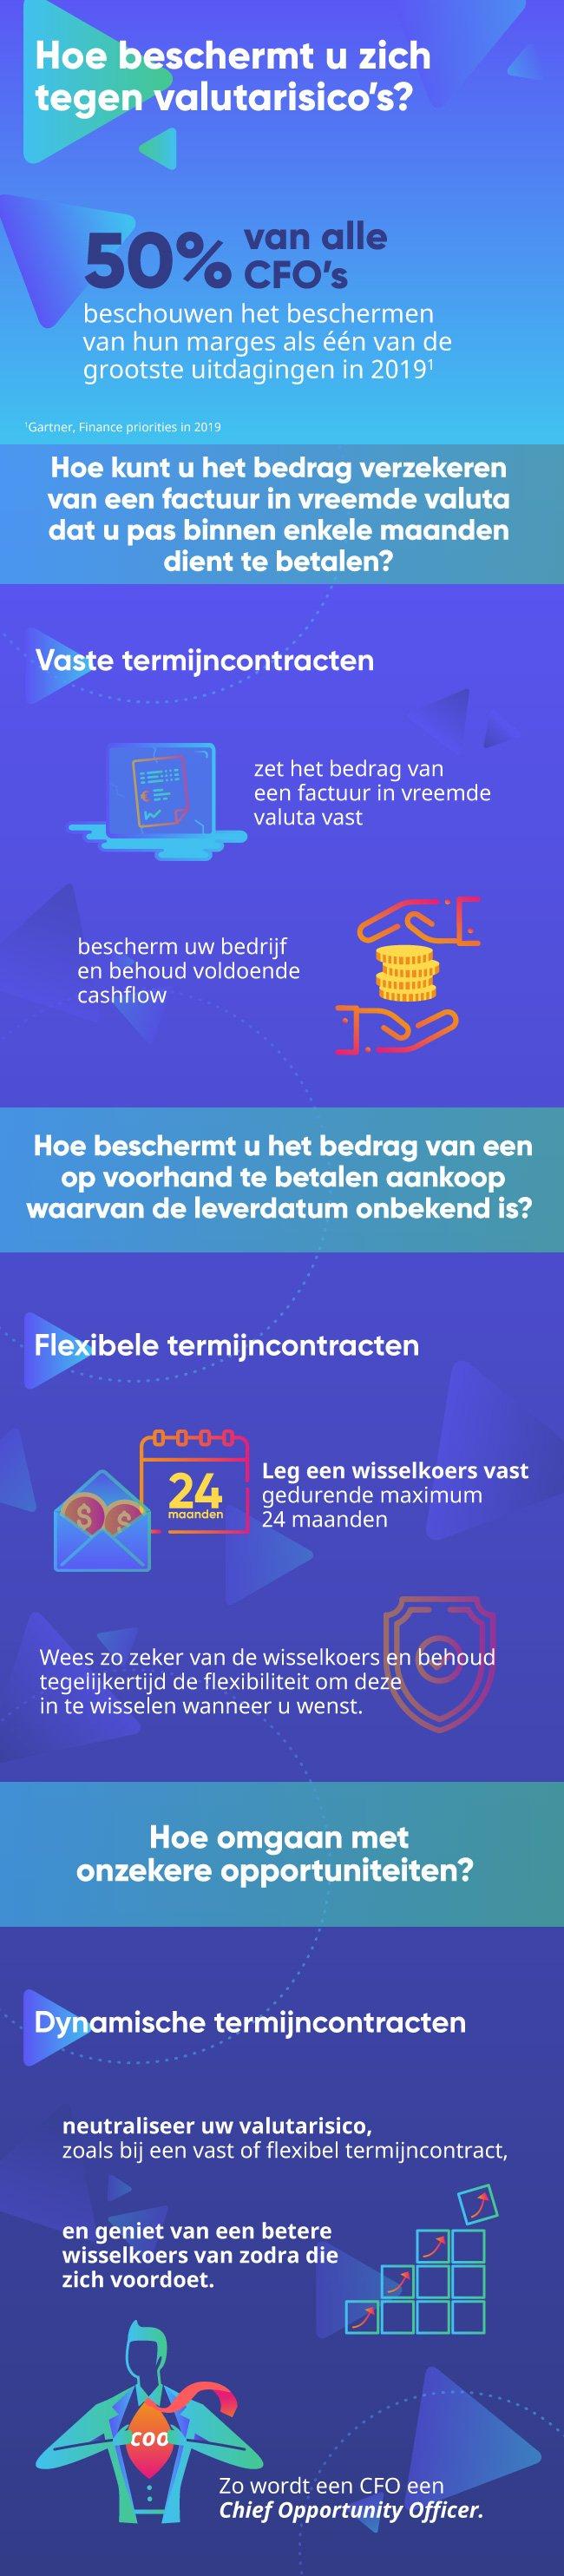 iBanFirst-infographie-couverture-change-NL-V3